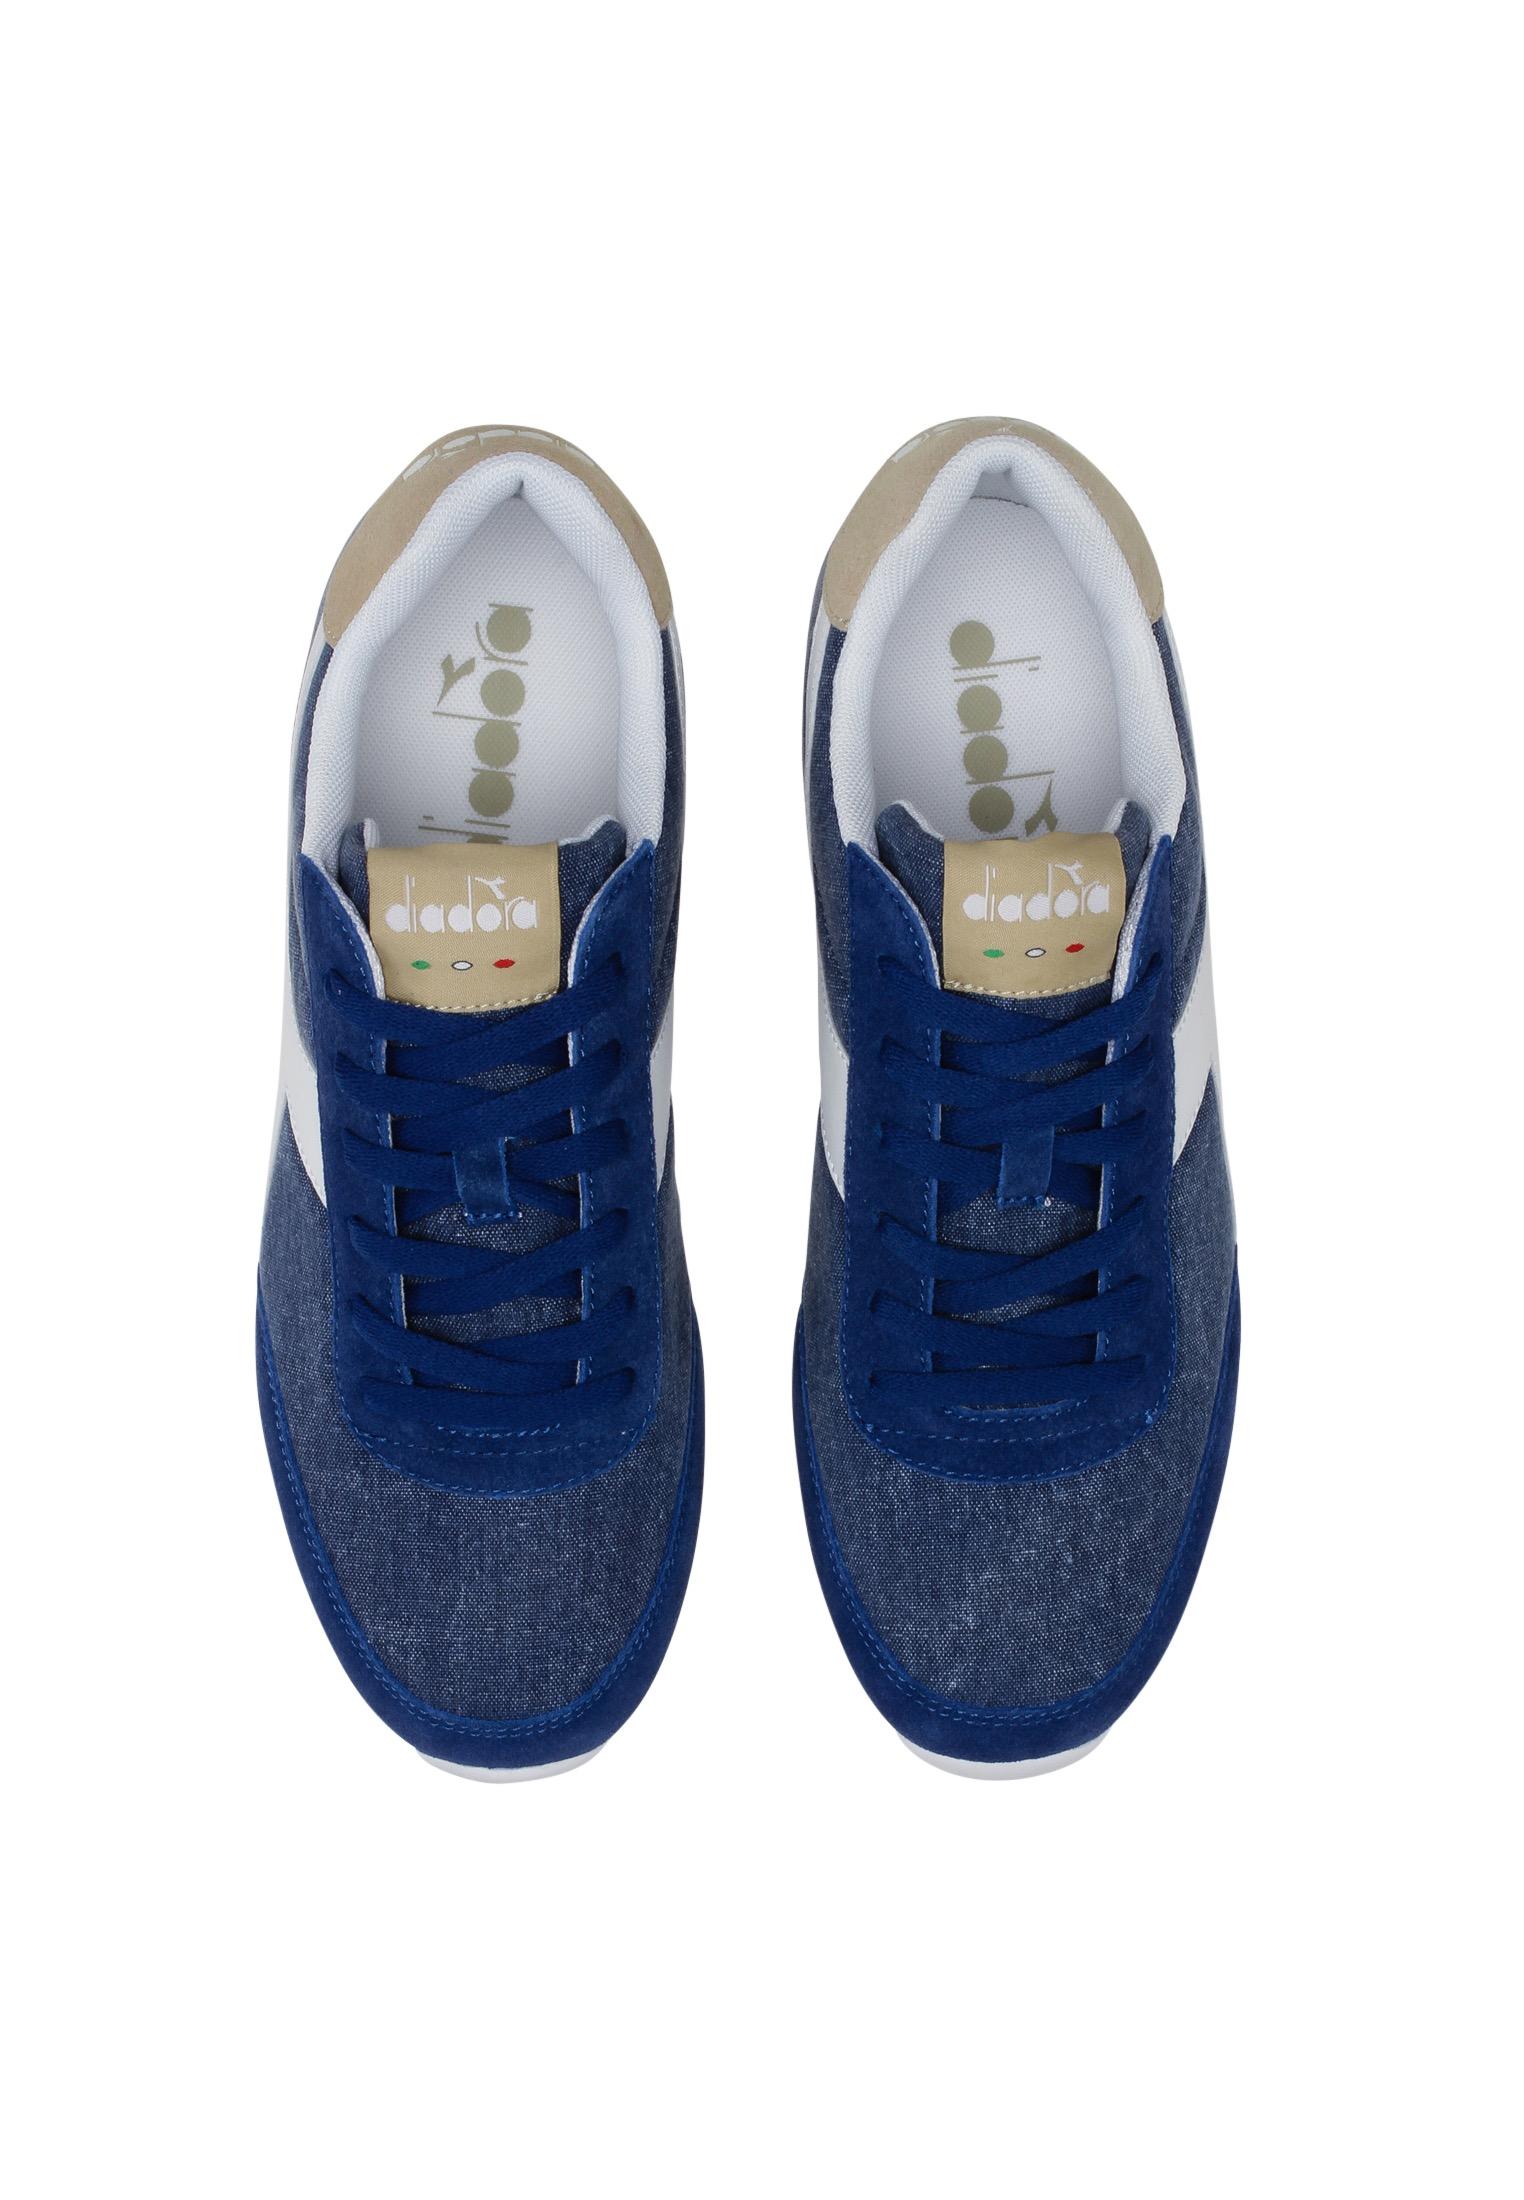 Scarpe-Diadora-Jog-Light-C-Sneakers-sportive-uomo-donna-vari-colori-e-taglie miniatura 17